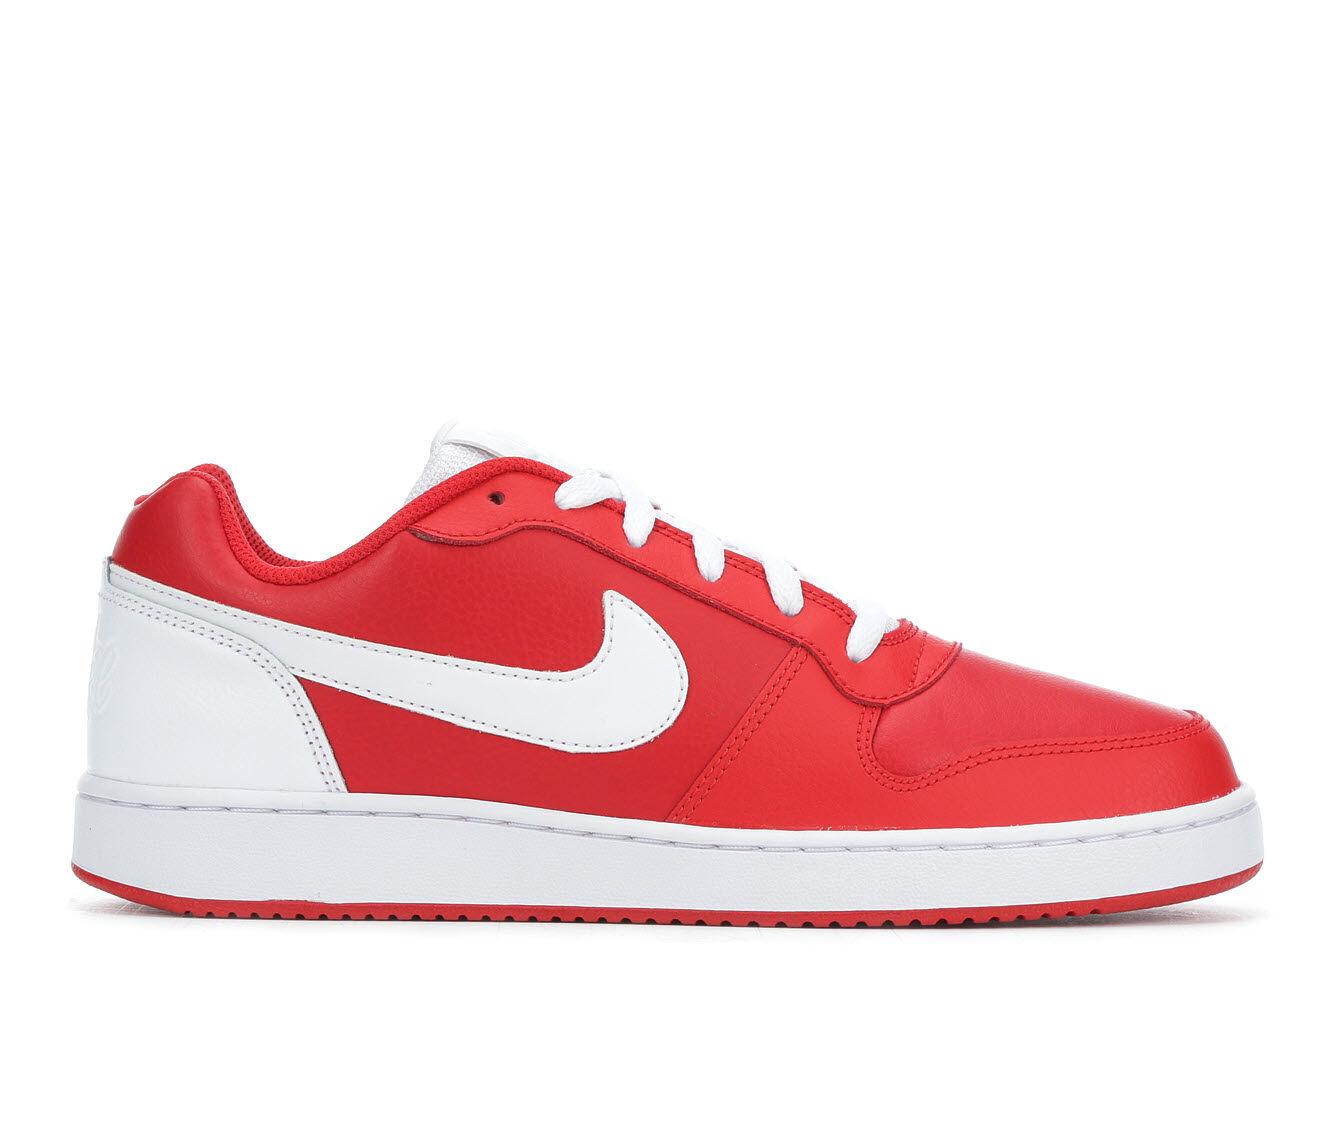 Men's Nike Ebernon Low Sneakers Red/Wht 600